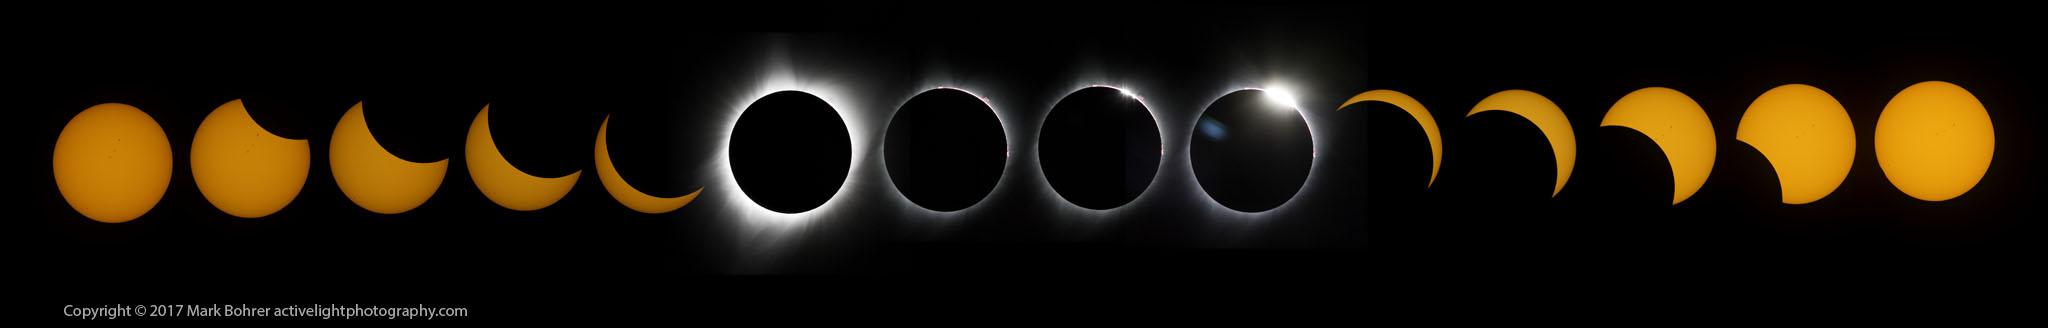 End to end eclipse composite in Rexburg, Idaho